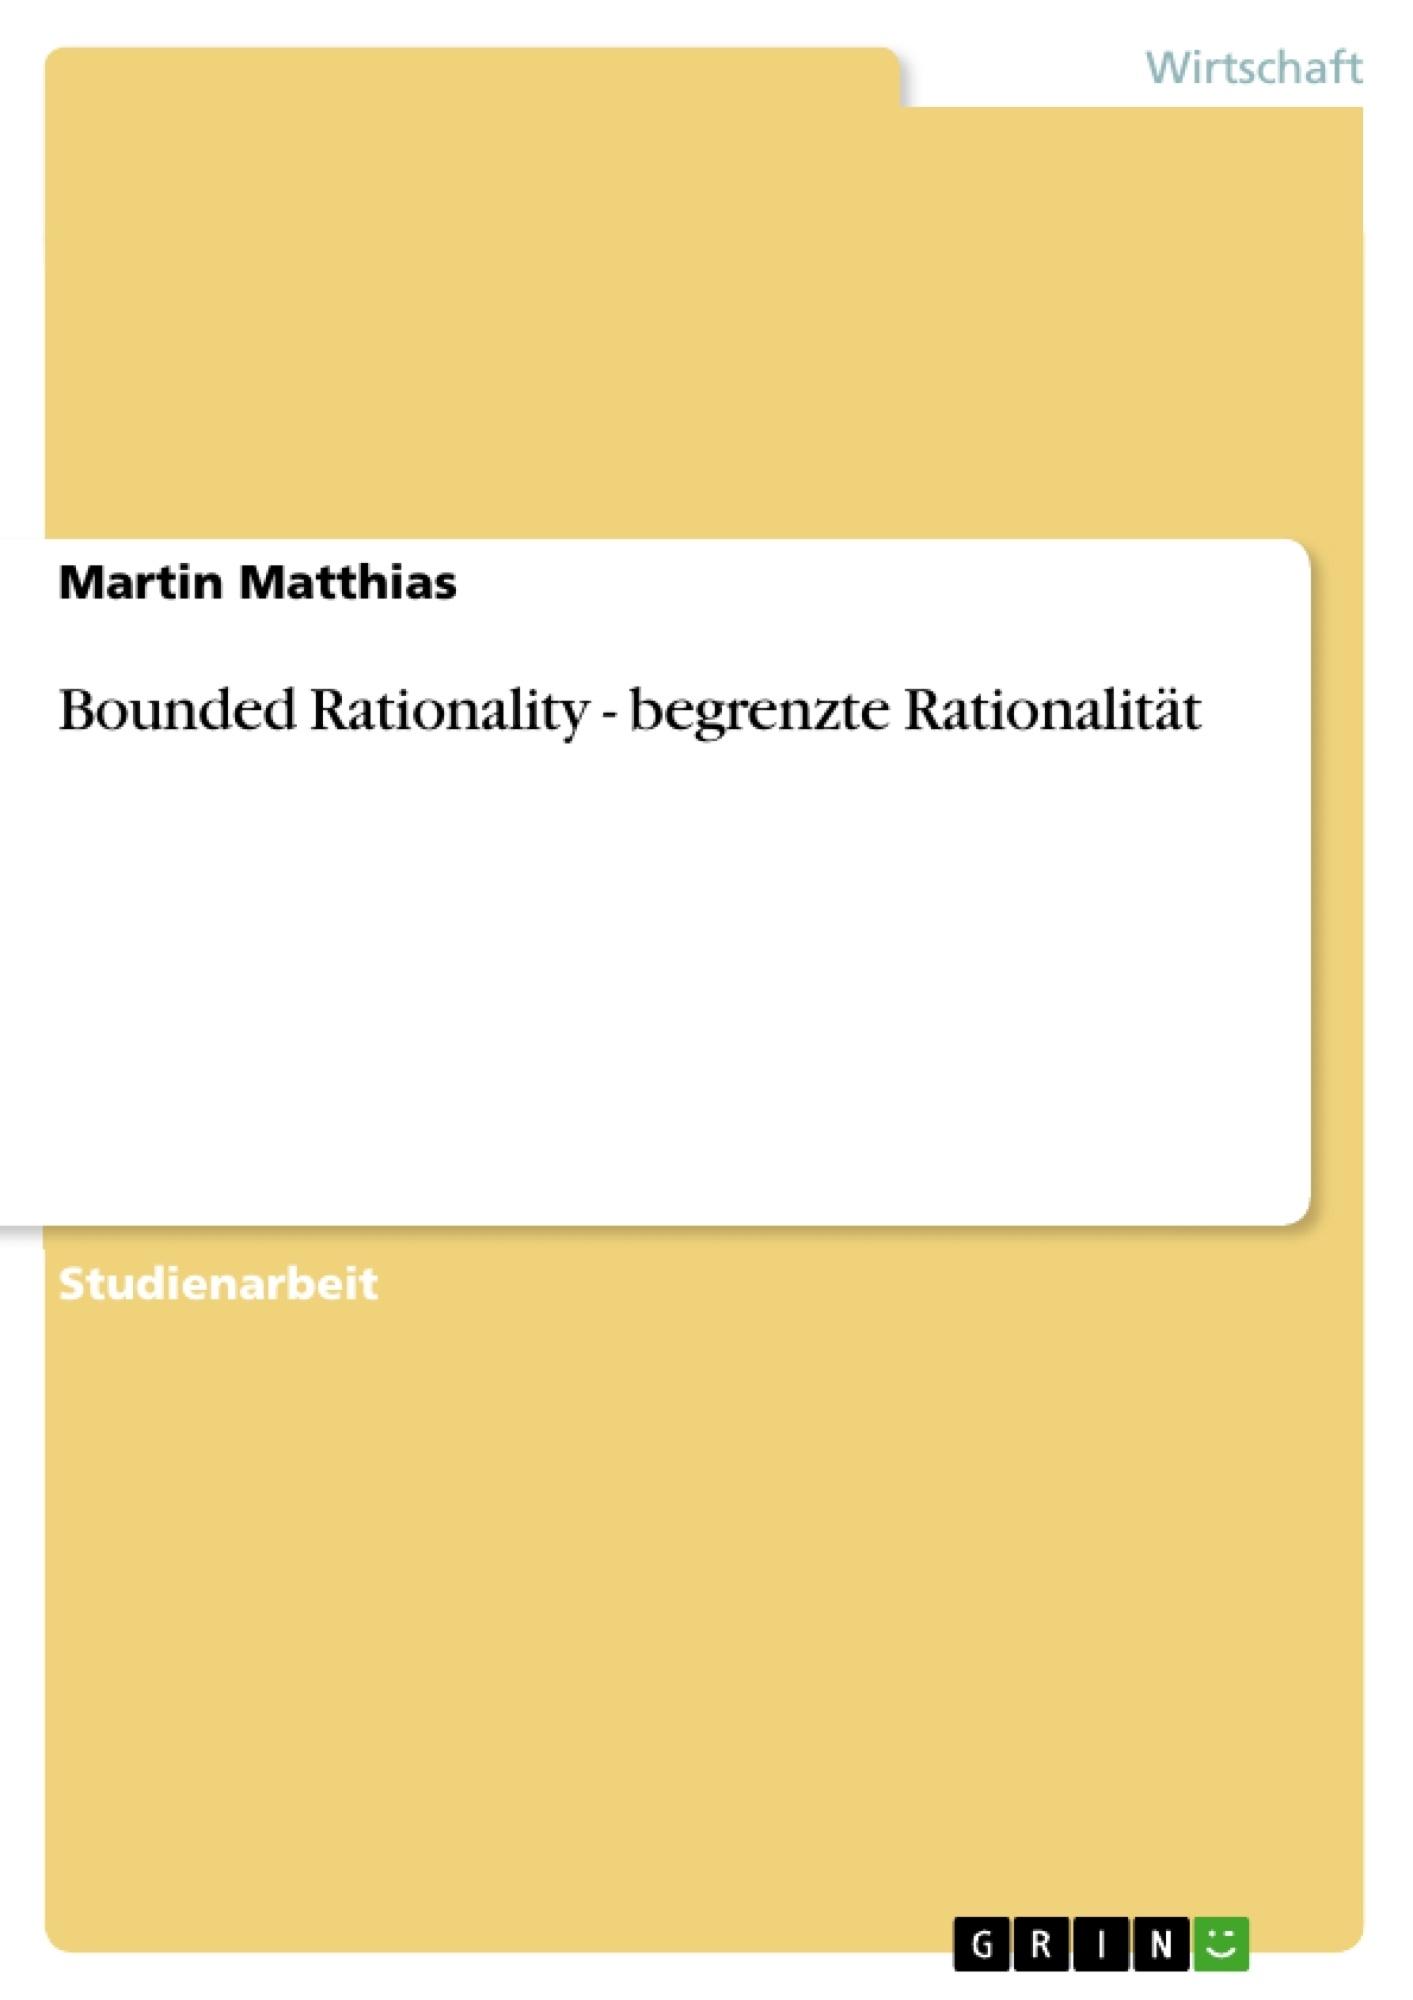 Titel: Bounded Rationality - begrenzte Rationalität